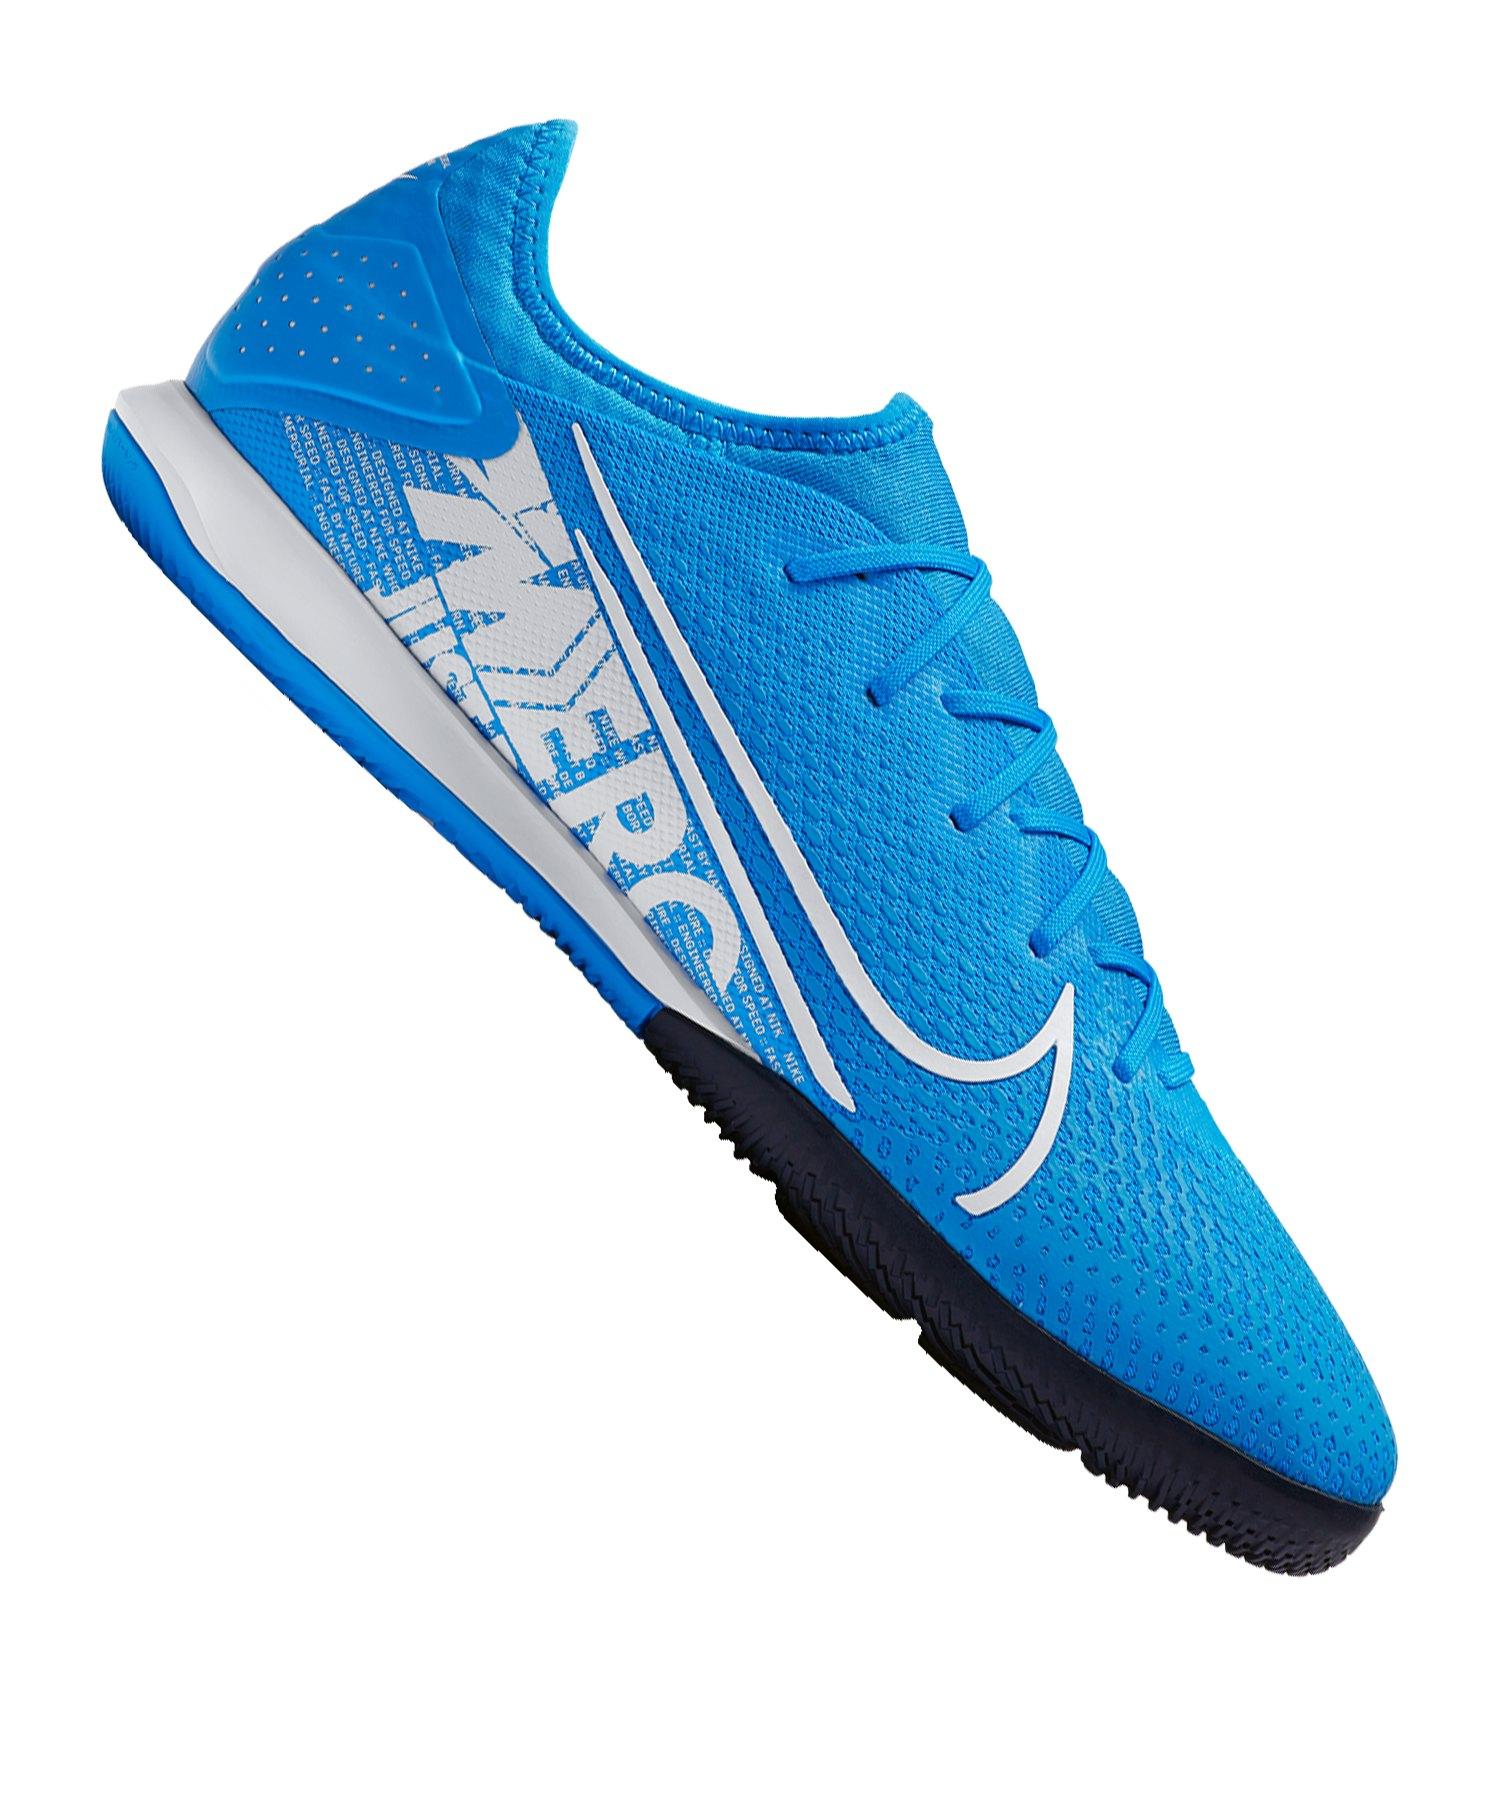 Nike Mercurial Vapor XIII Pro IC Blau Weiss F414 - blau